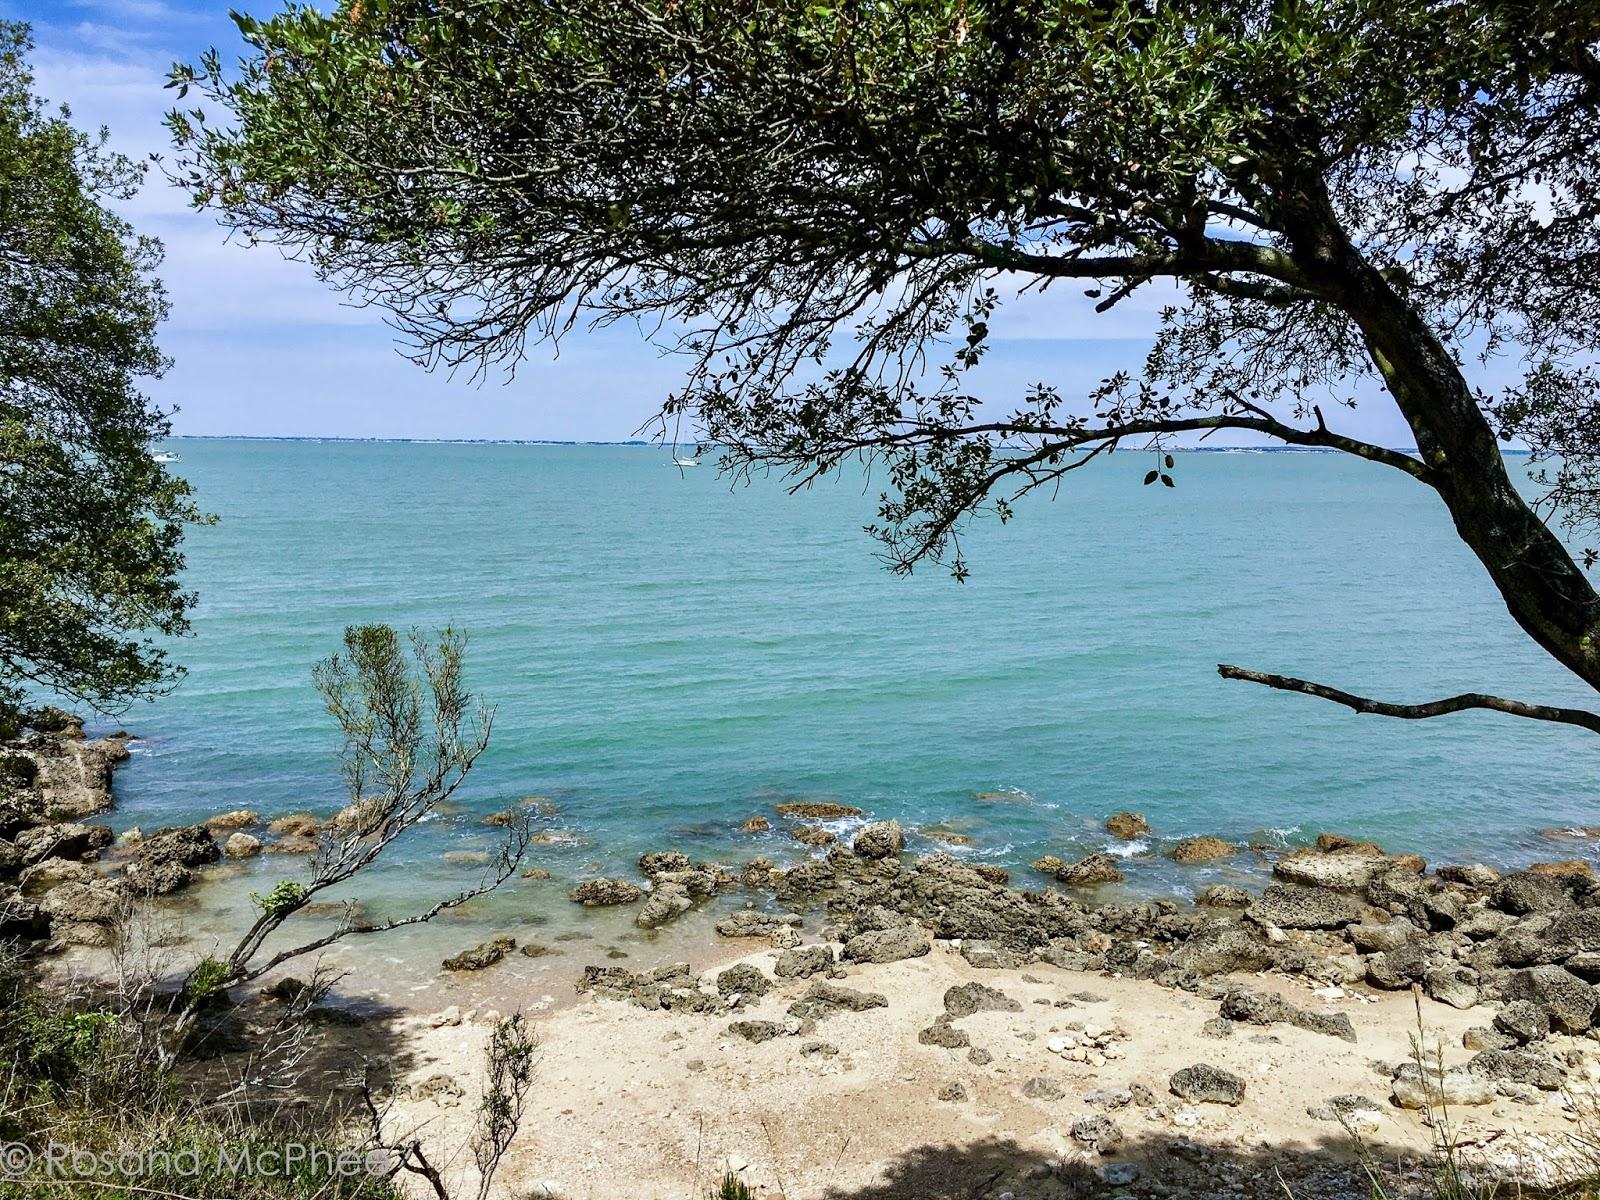 Plage pleine de charme Baby plage île dAix #fouras #